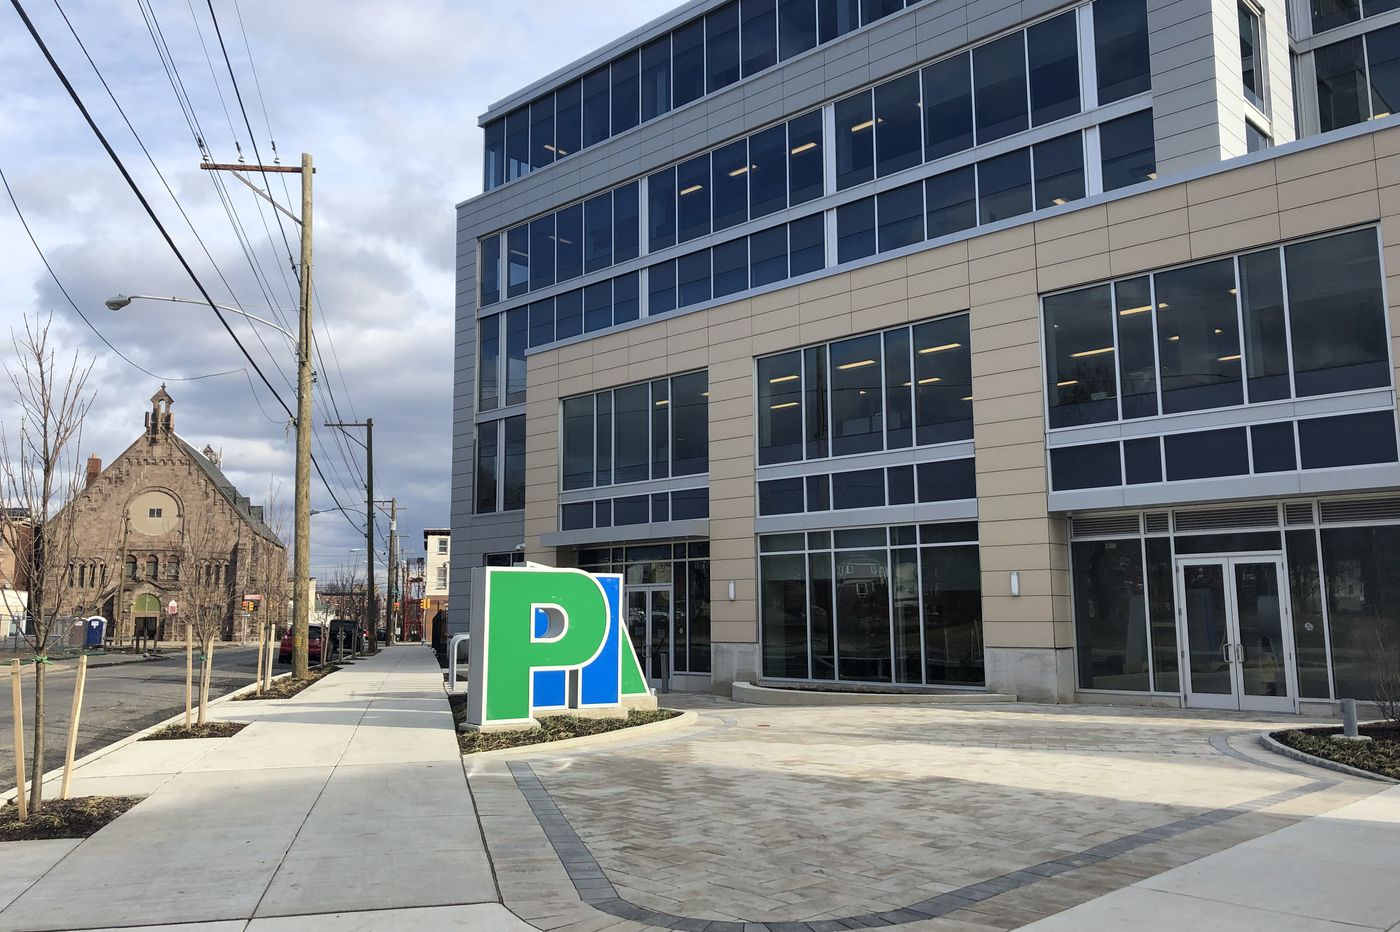 With Philadelphia Housing Authority's move to Sharswood, the struggle to revive Ridge Avenue begins | Inga Saffron